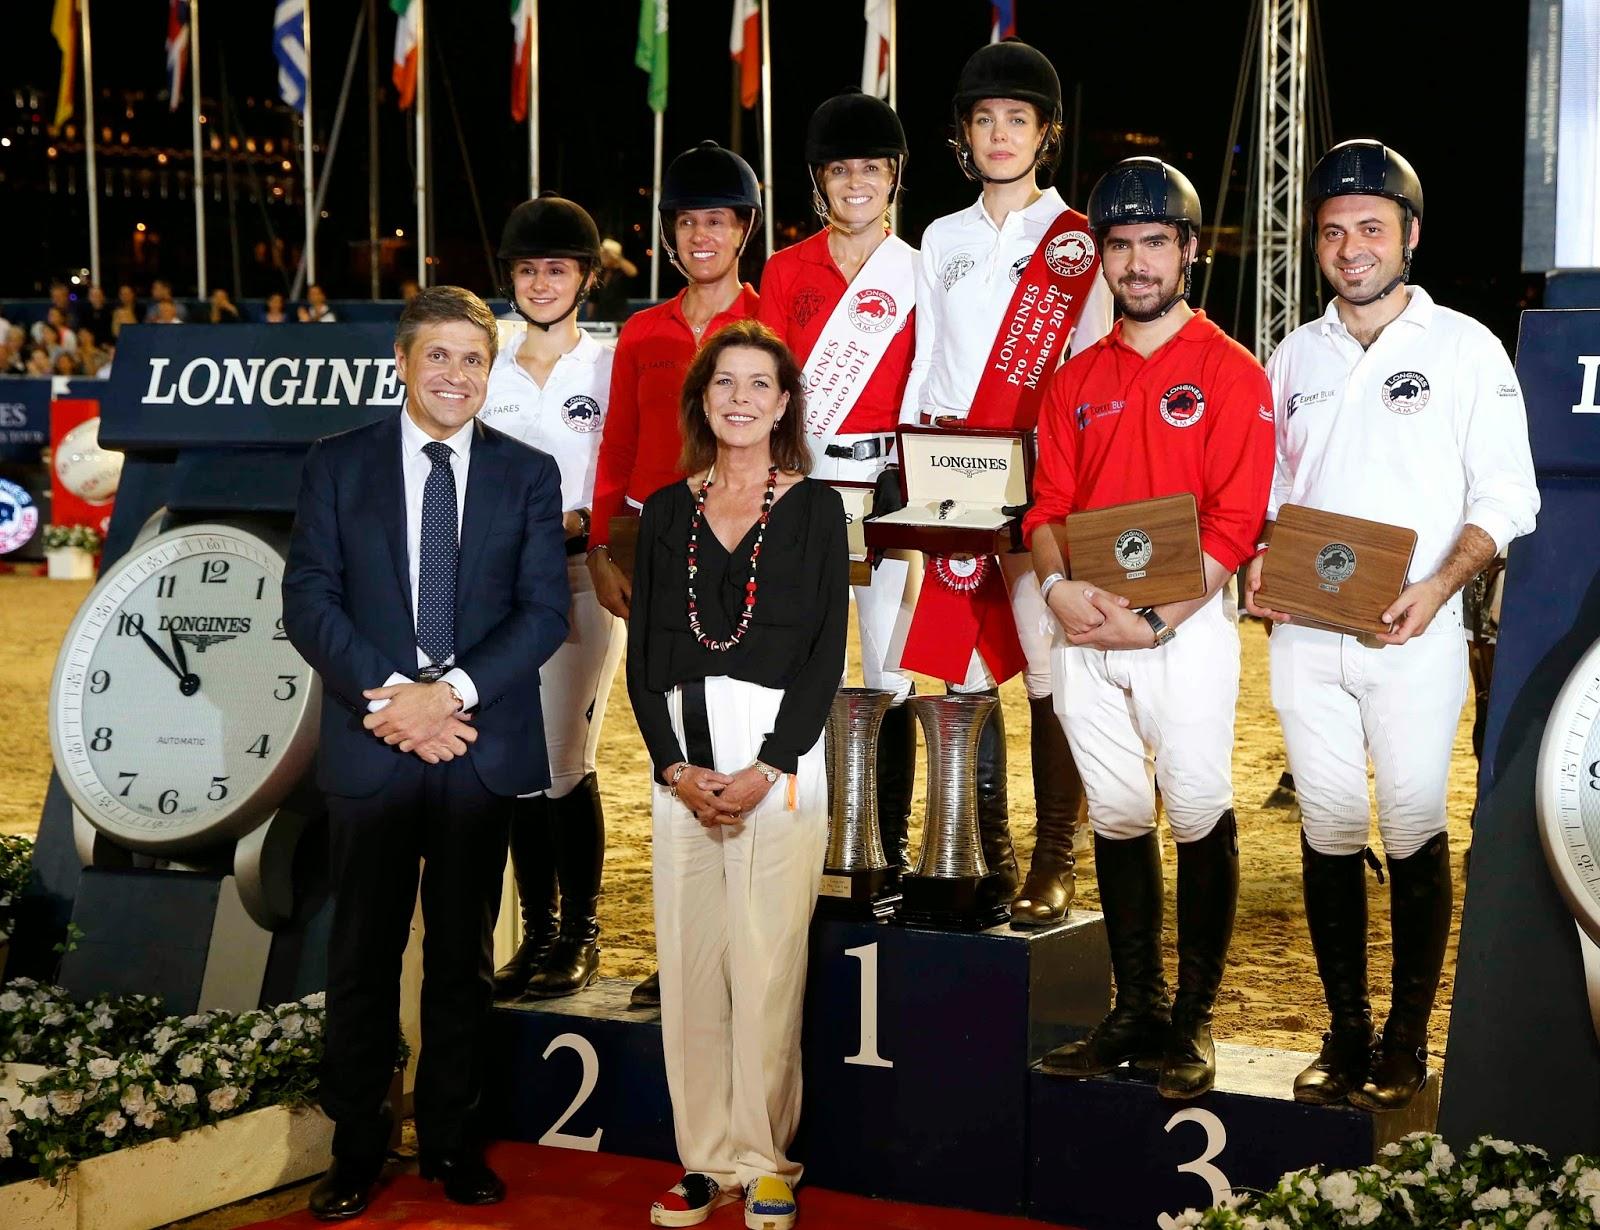 LONGINES Conquest, Global Champions Tour 2014 Montecarlo, Charlotte Casiraghi, Juan Carlos Capelli, Carolina di Monaco, pro am cup, equitazione, show jumping